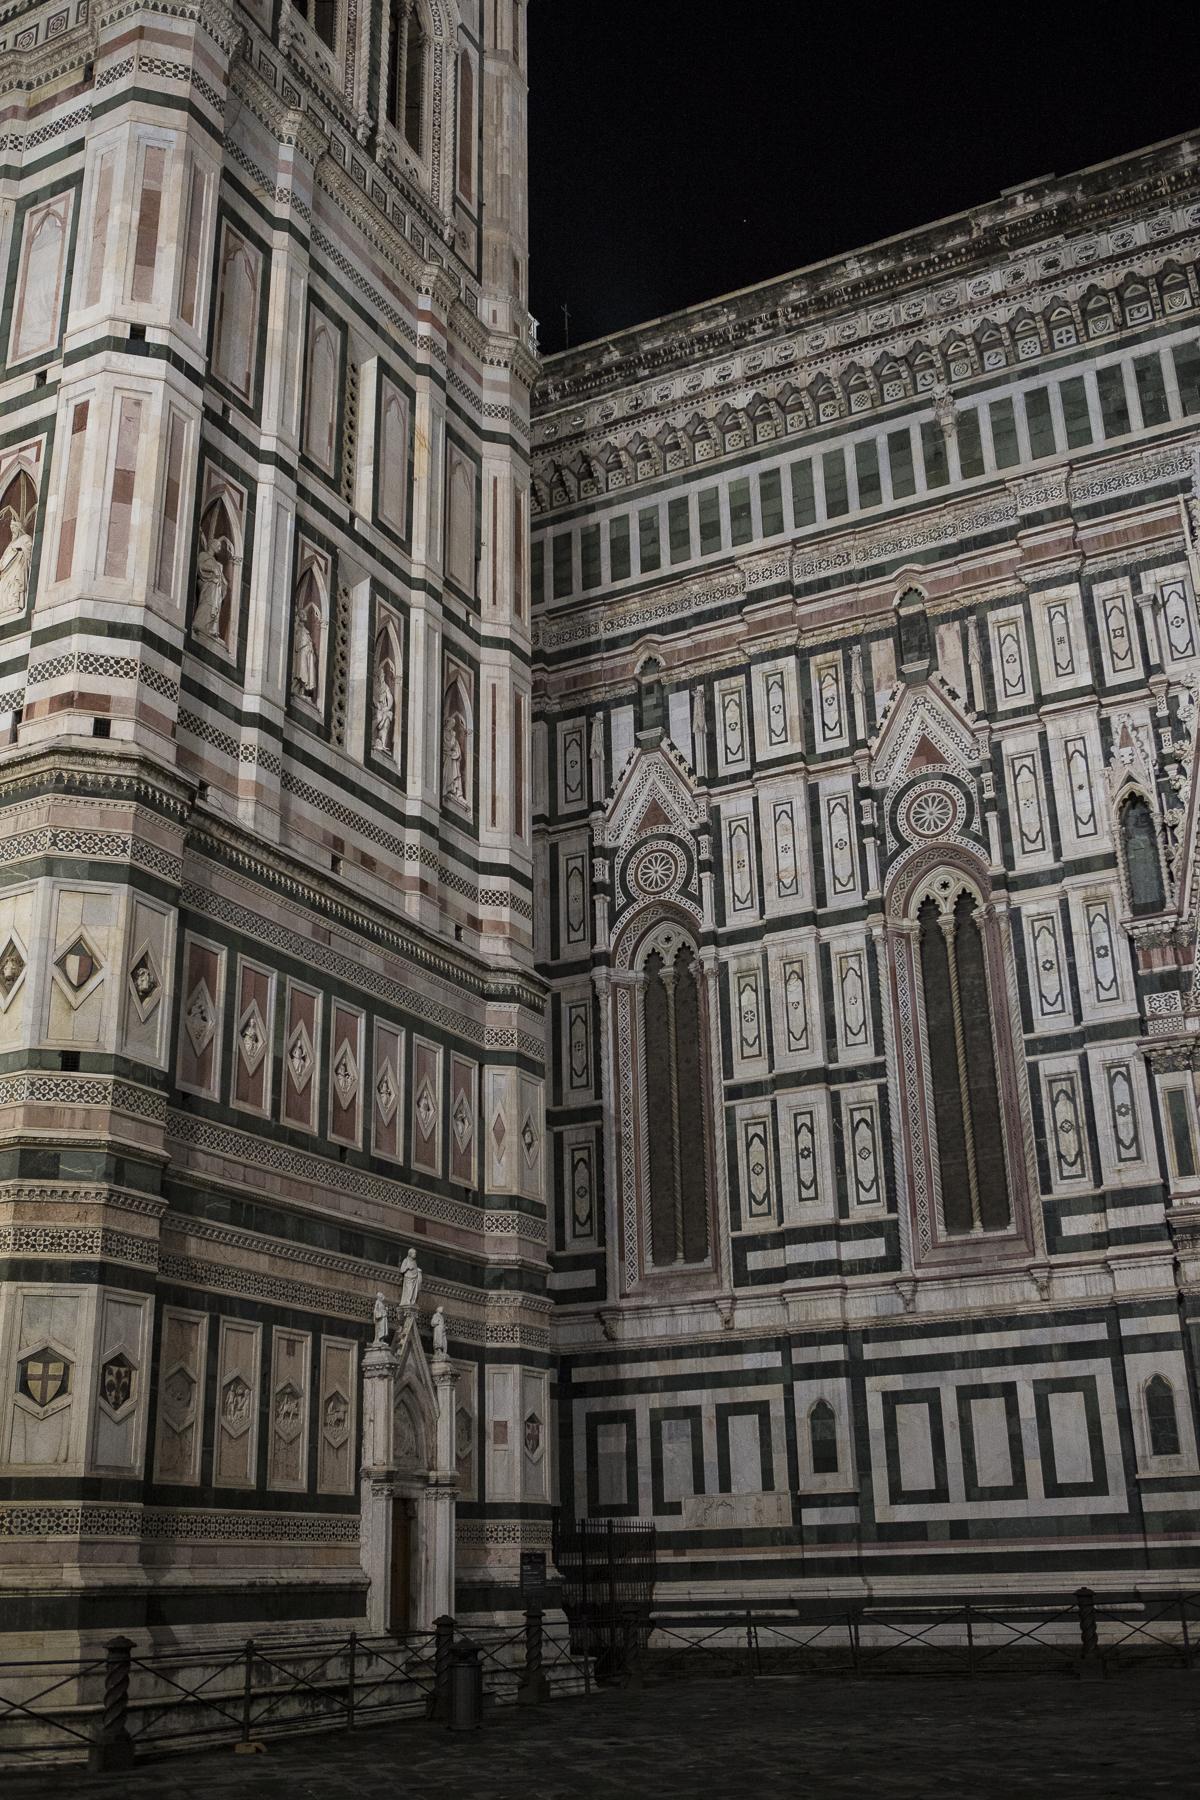 Firenze nights-8.jpg